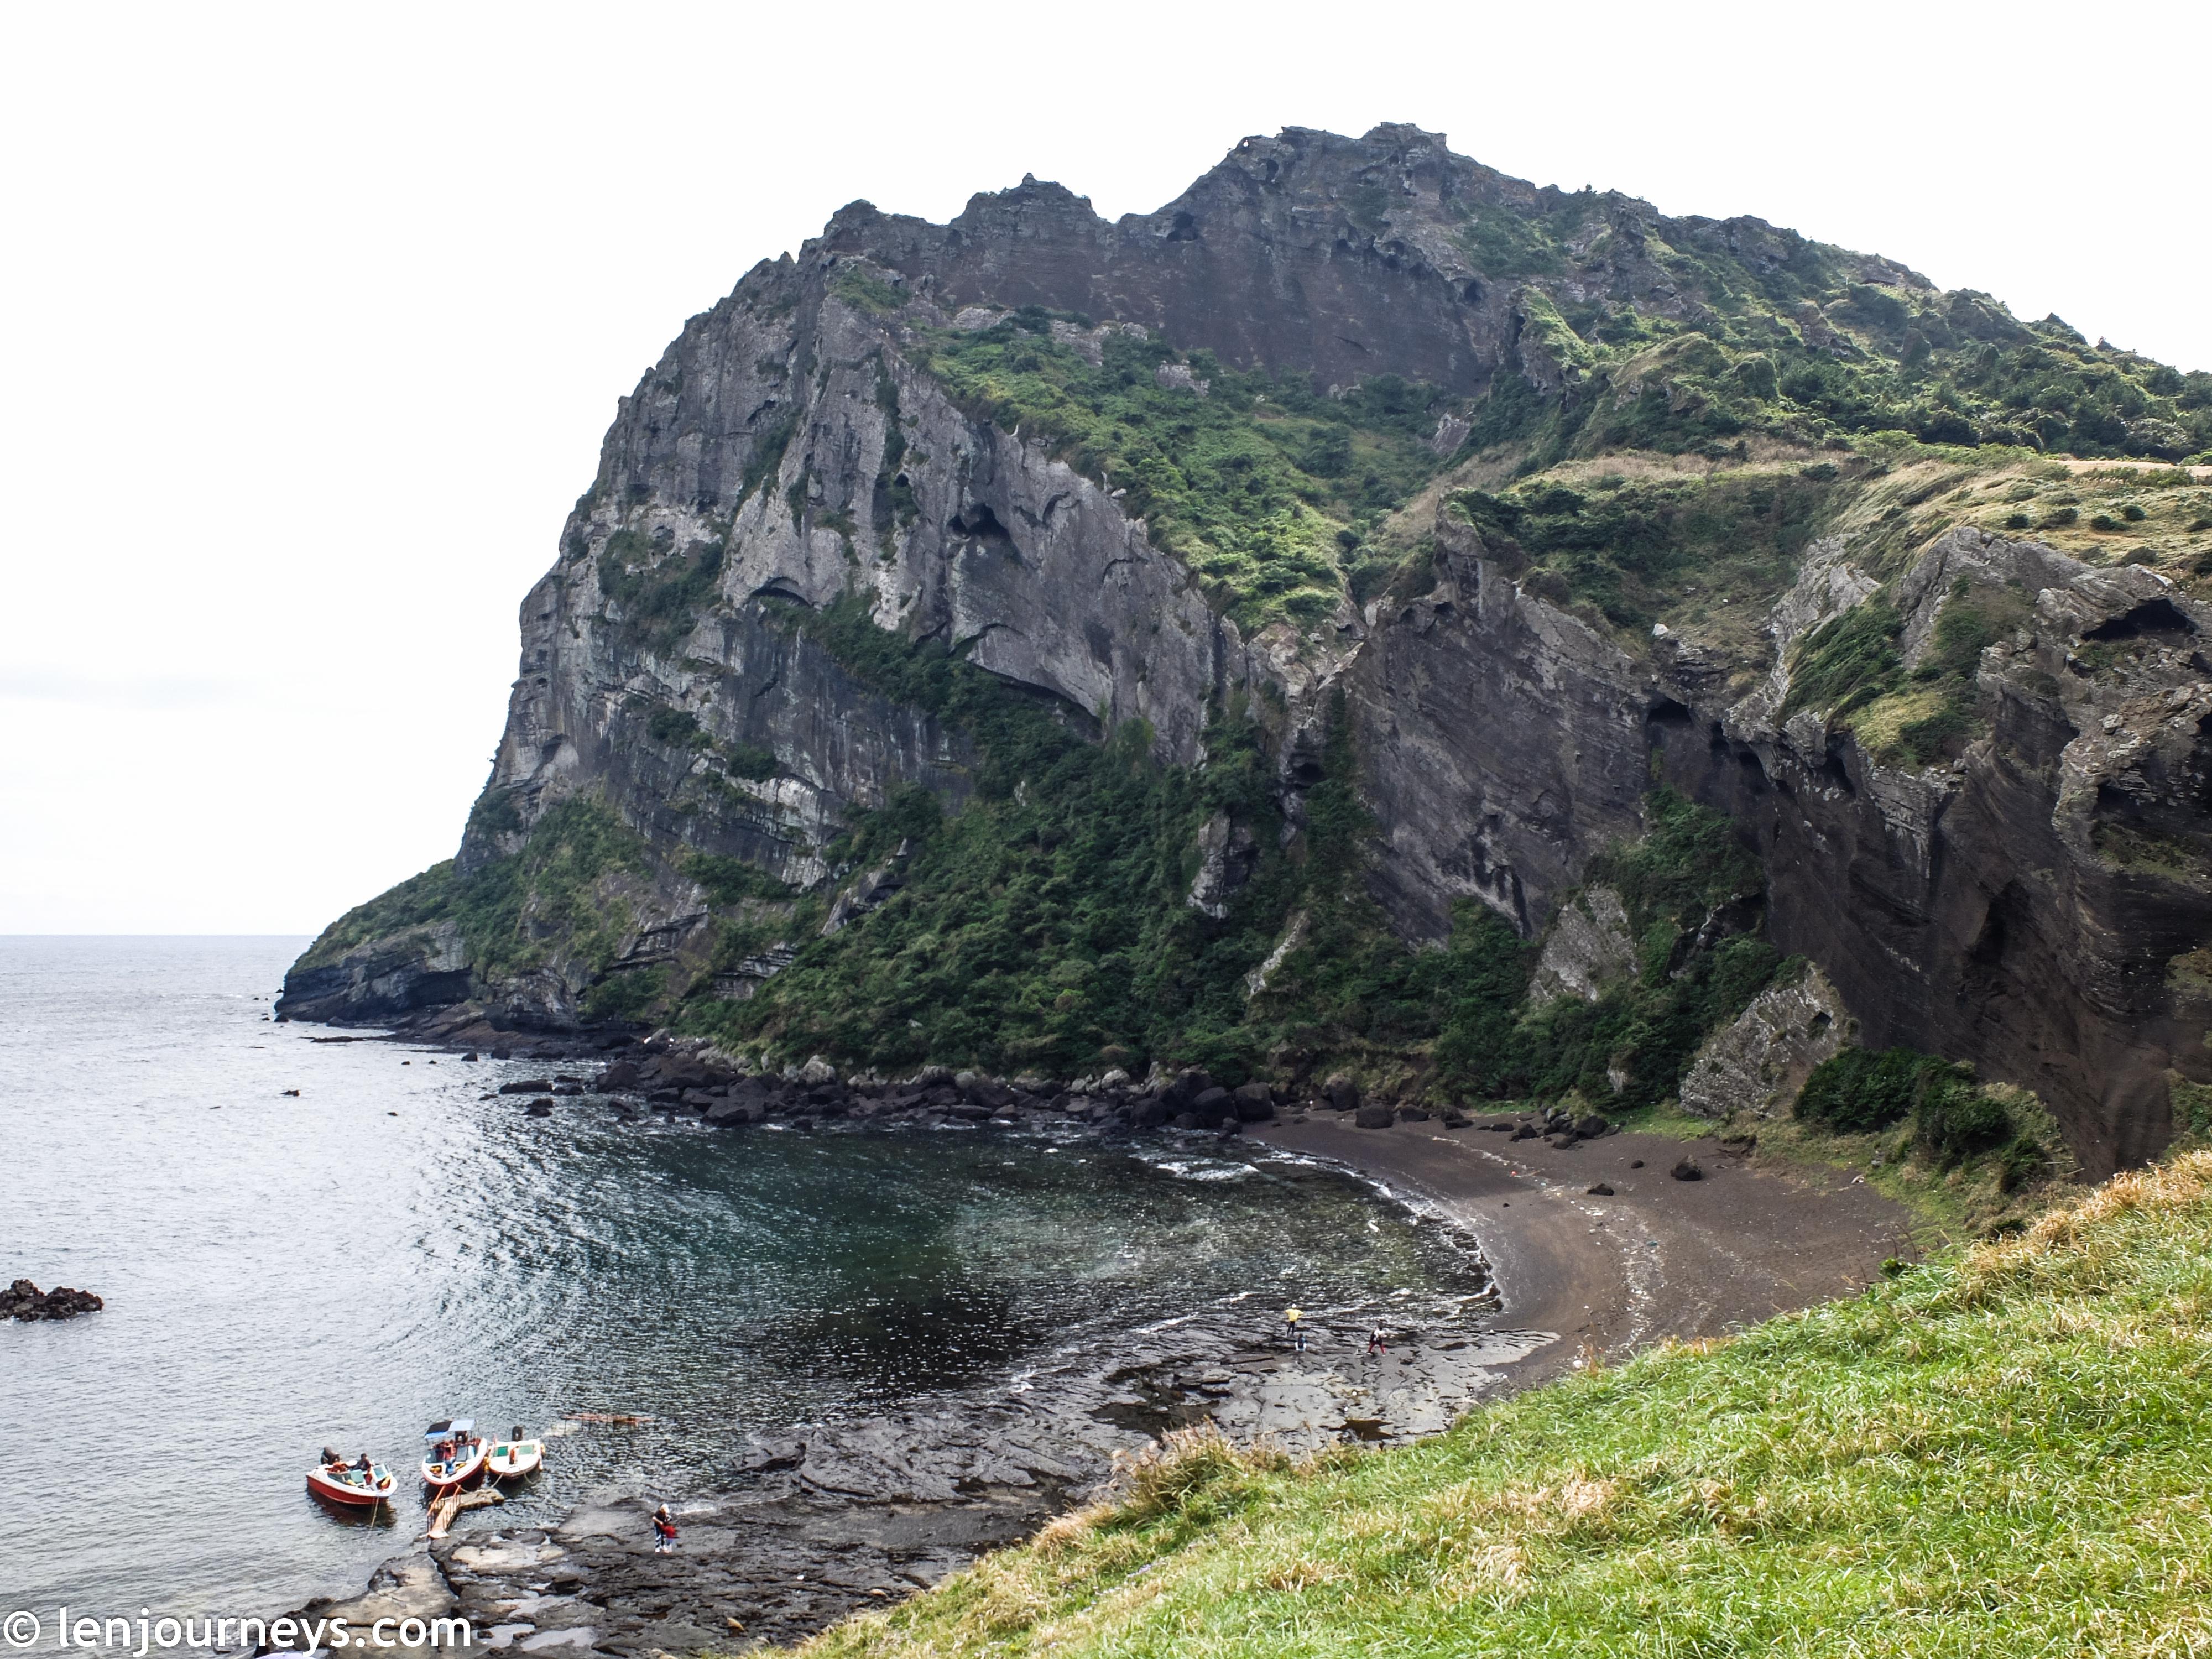 Dramatic rocky outcrop